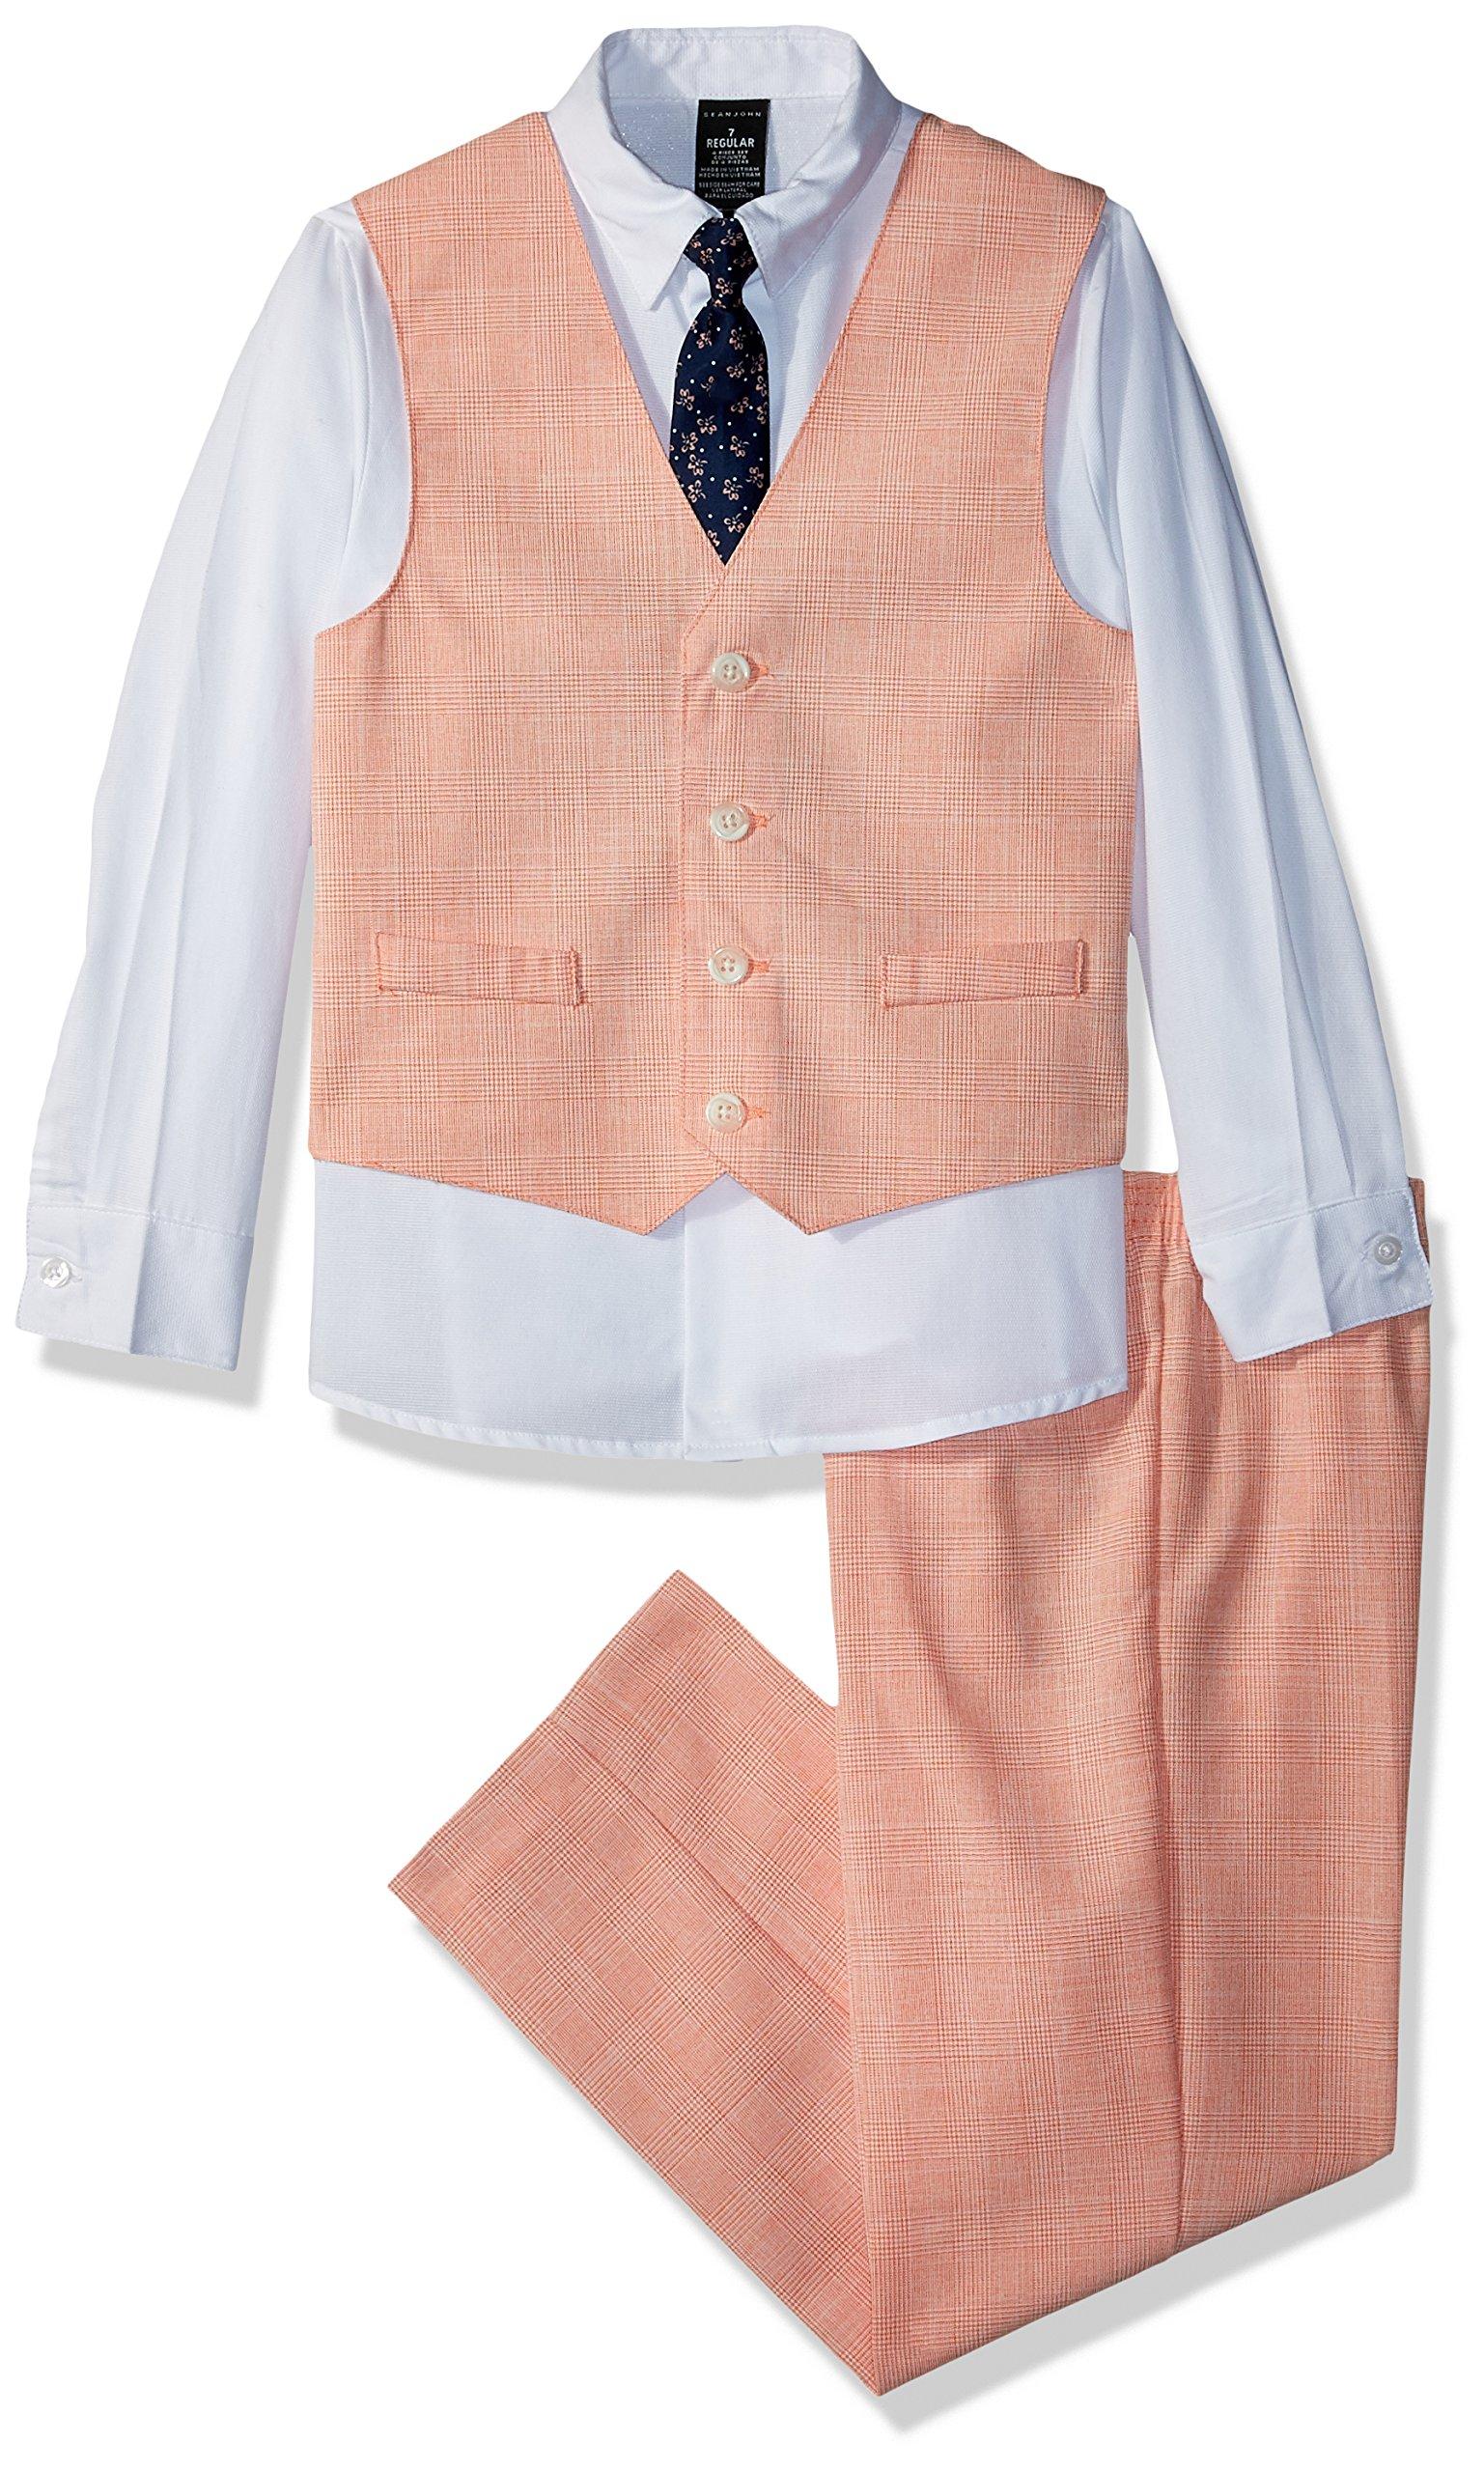 Sean John Boys' Big' 4-Piece Dresswear Vest Set, Passionate Pea Plaid, 18